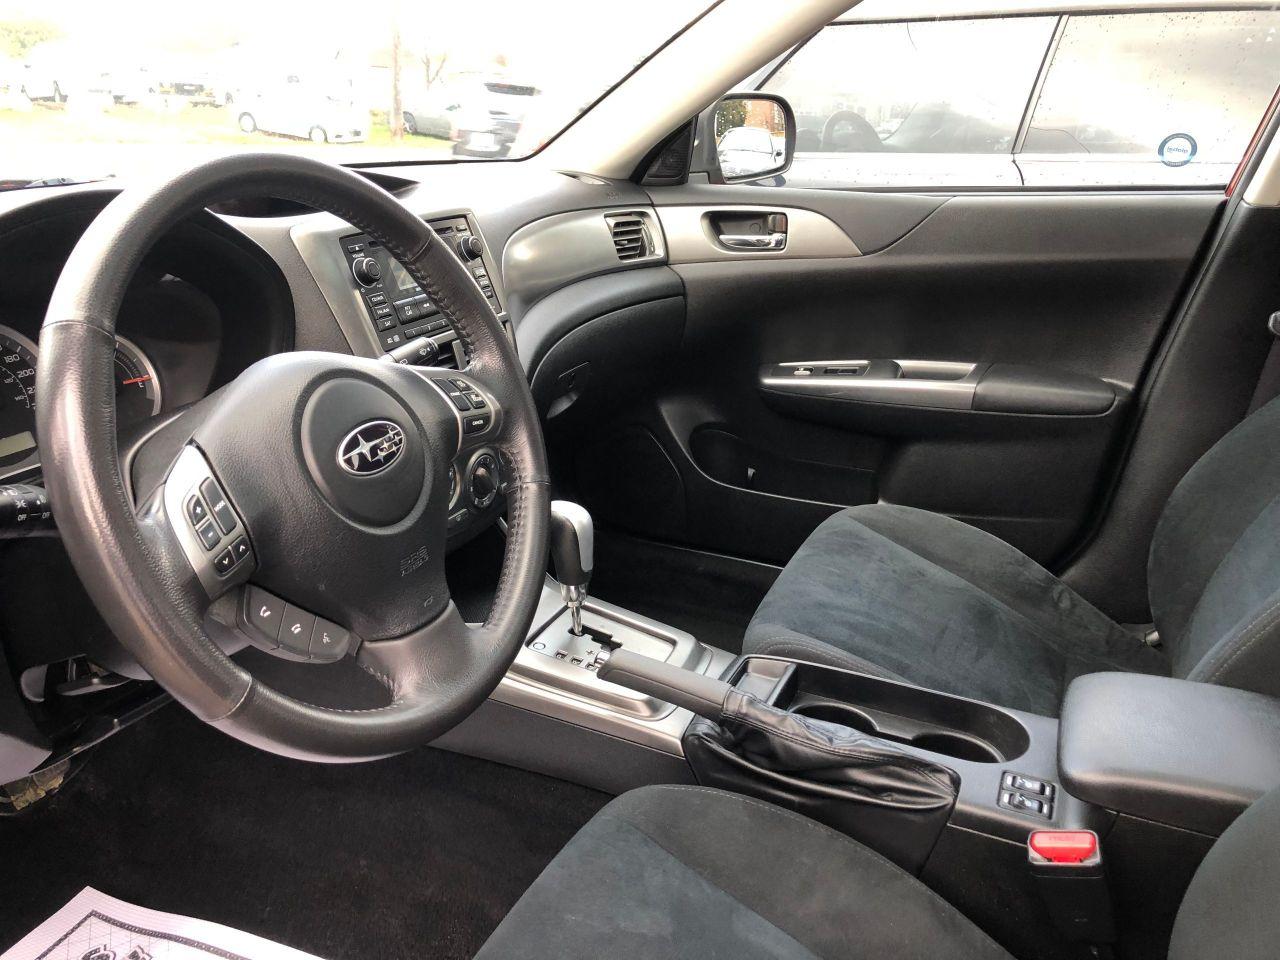 2011 Subaru Impreza